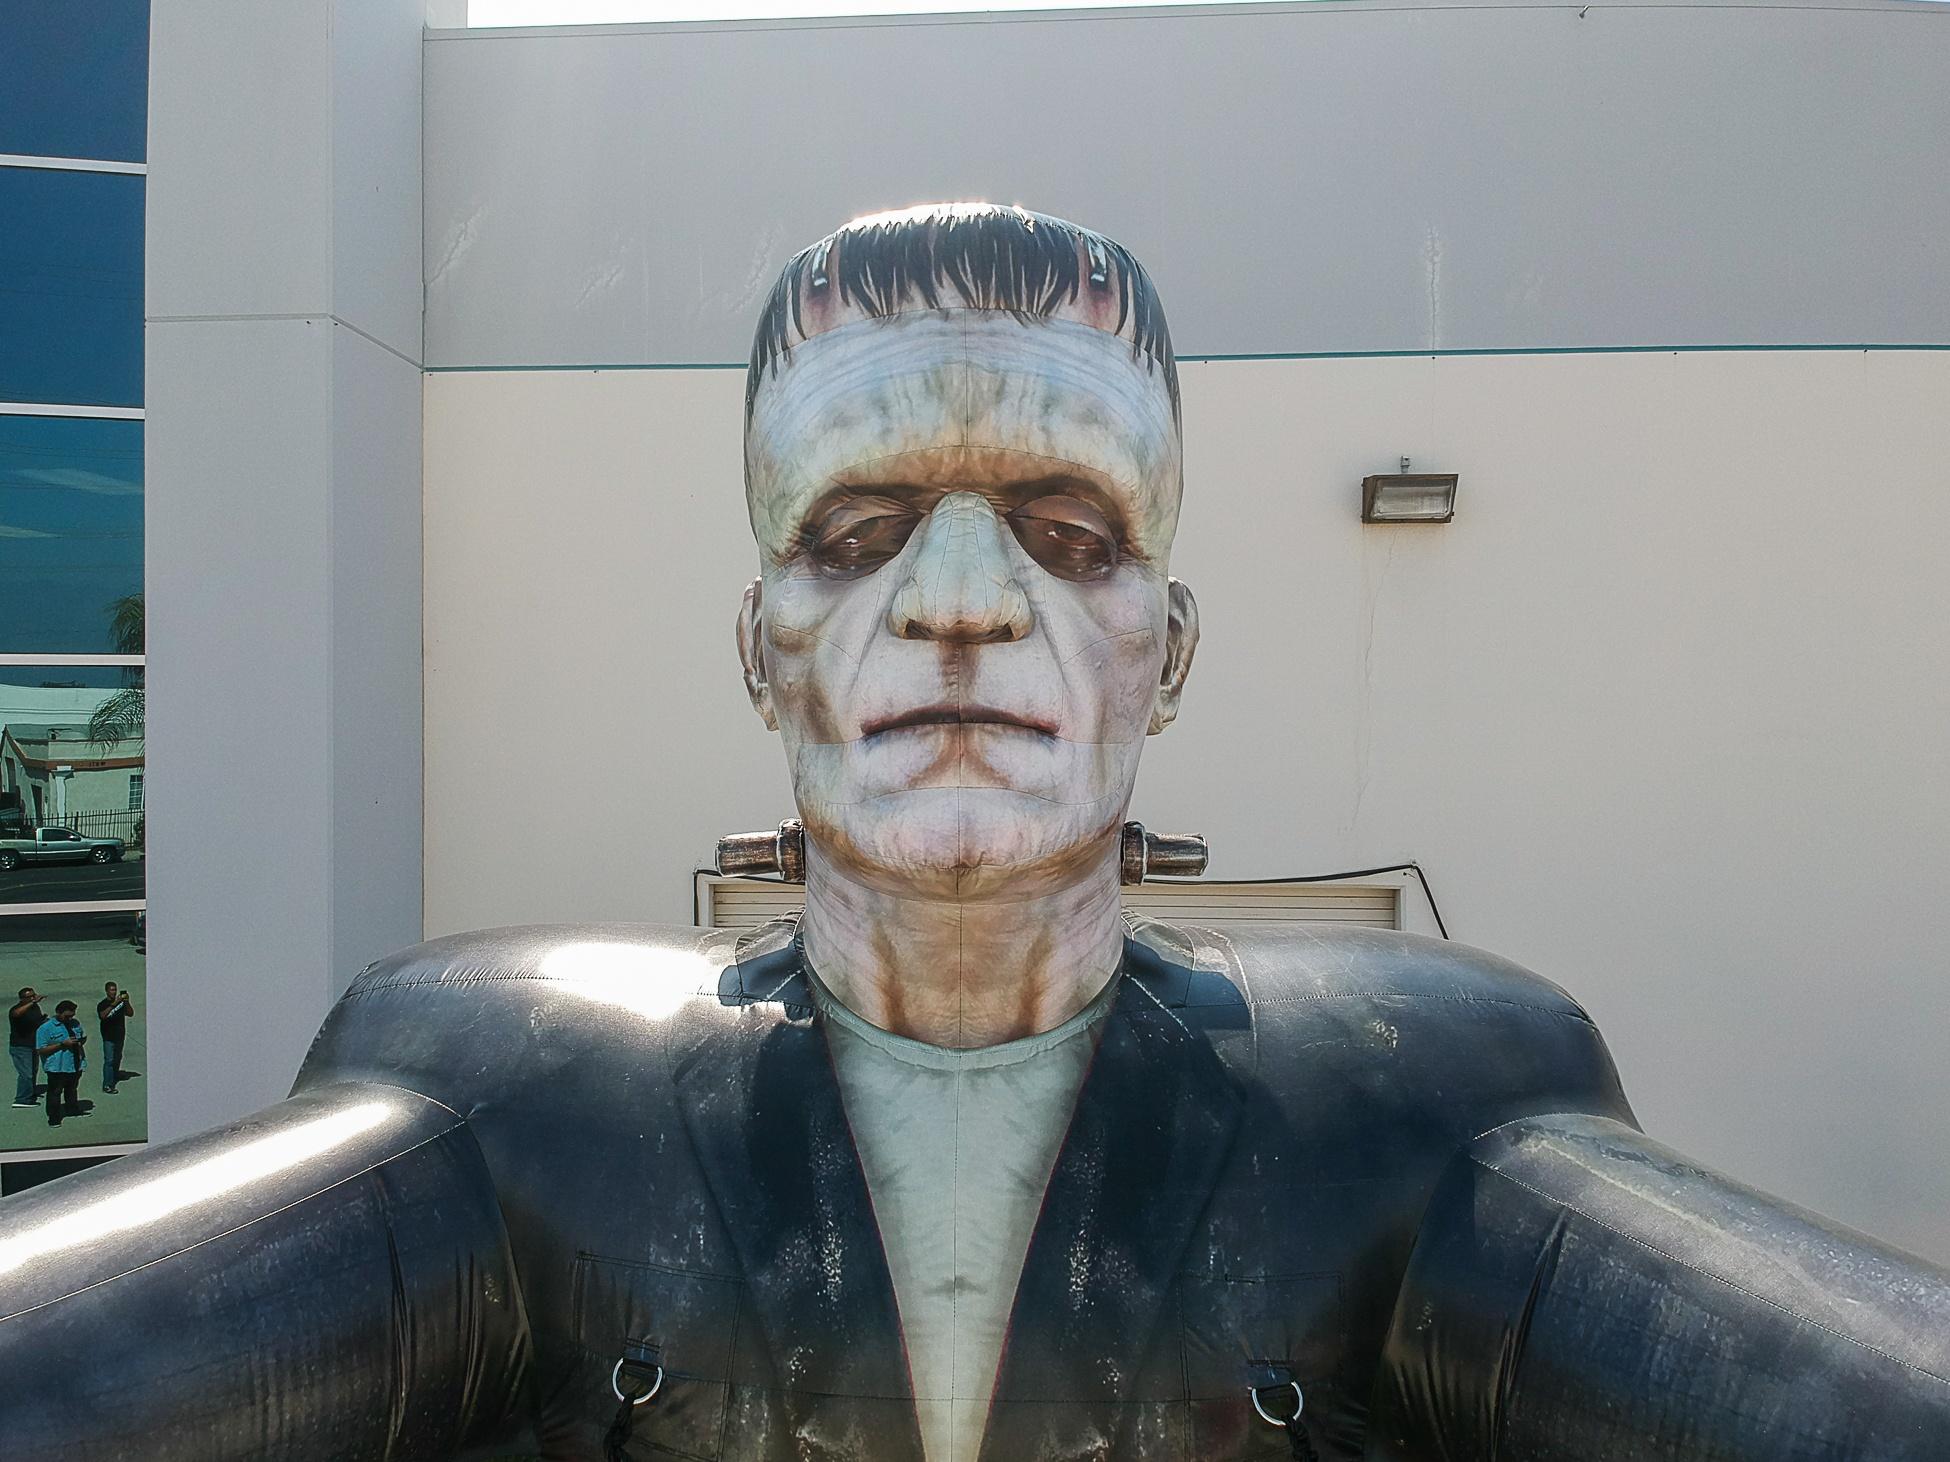 frankenstein-inflatable-face